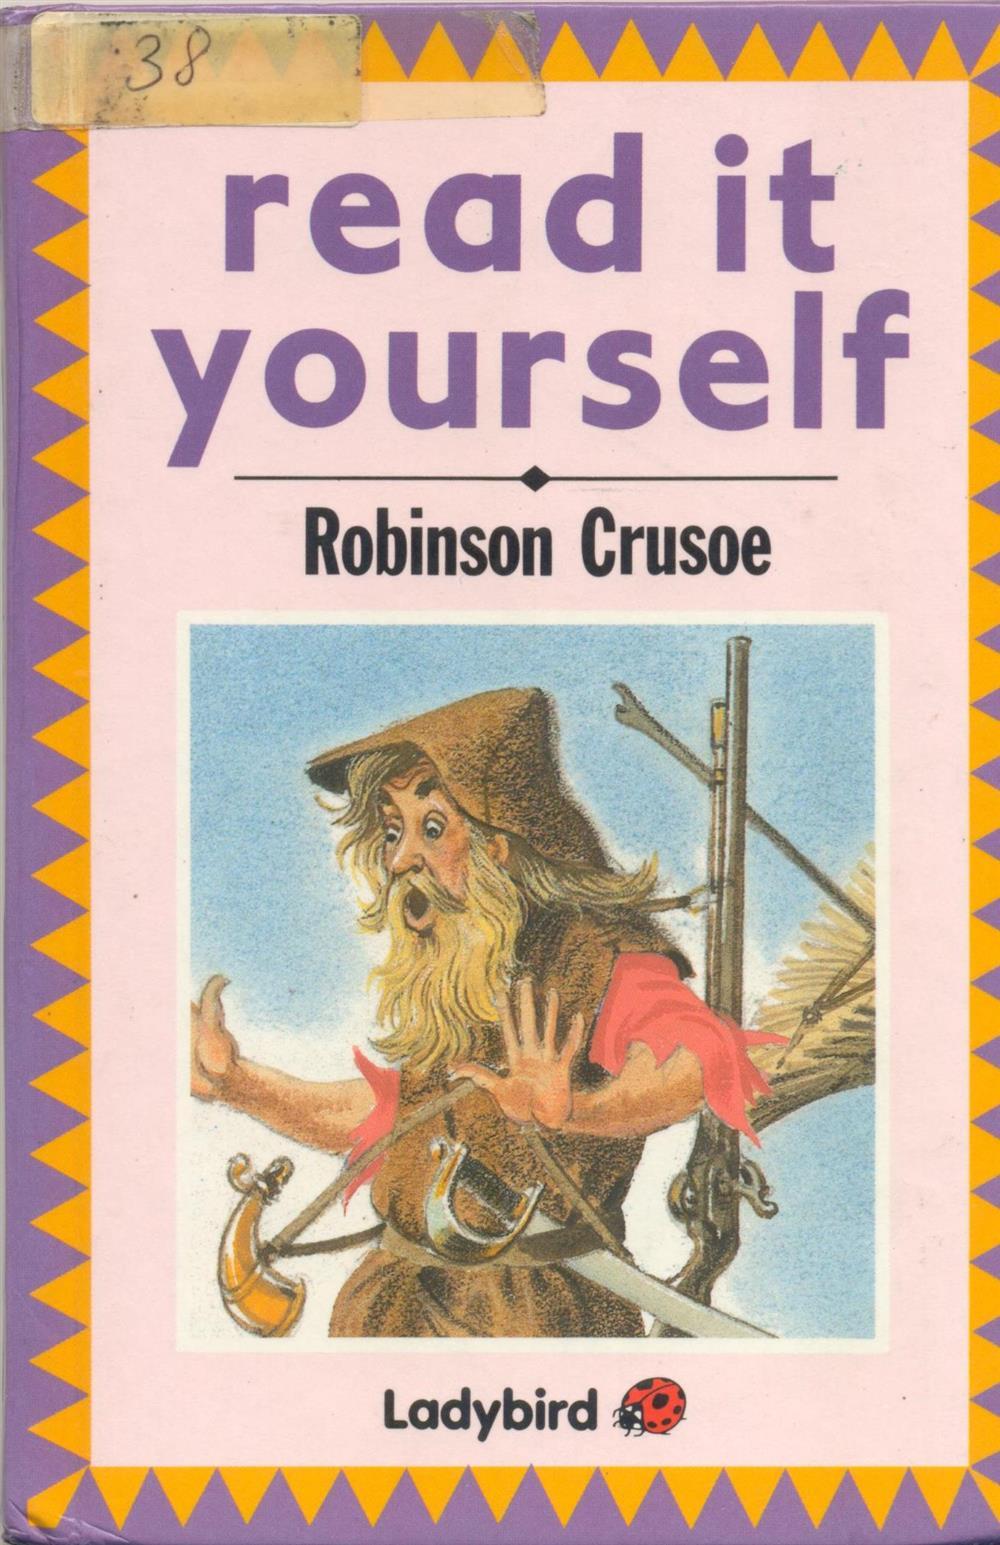 Robinson Crusoe 001.jpg